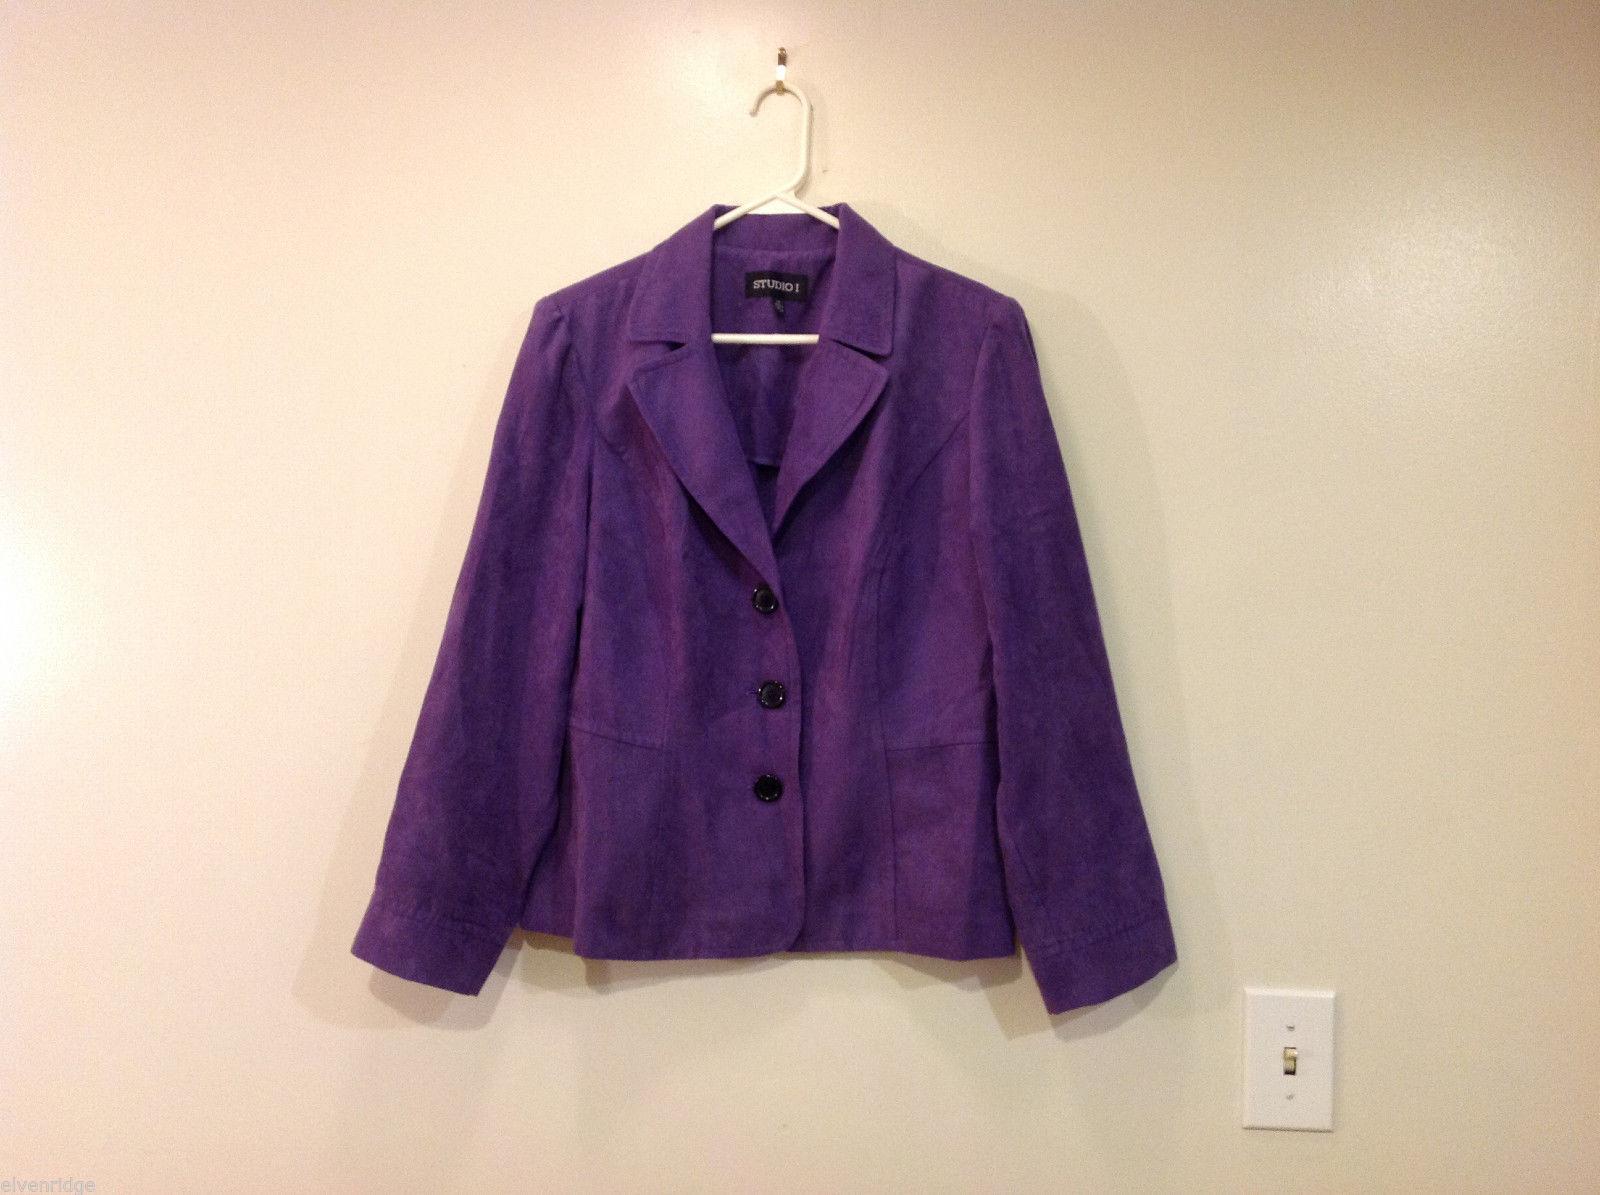 Studio 1 Violet Microfiber suede mole skin Lightweight Summer Jacket Top Size 14